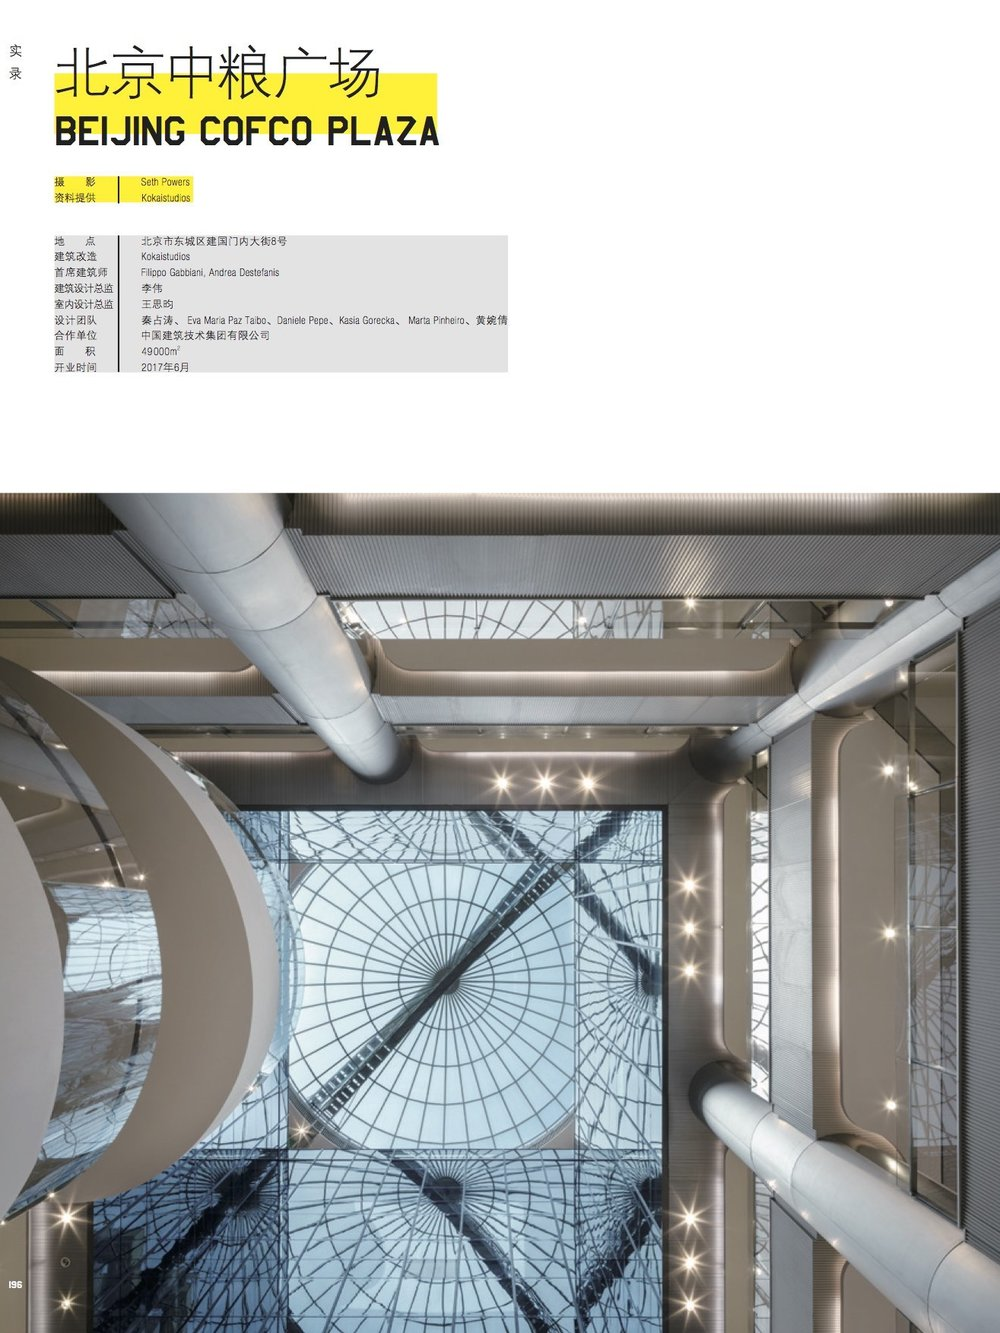 Interior Designer | Vol 66 March 2018 - Beijing COFCO Plaza |Kokaistudios